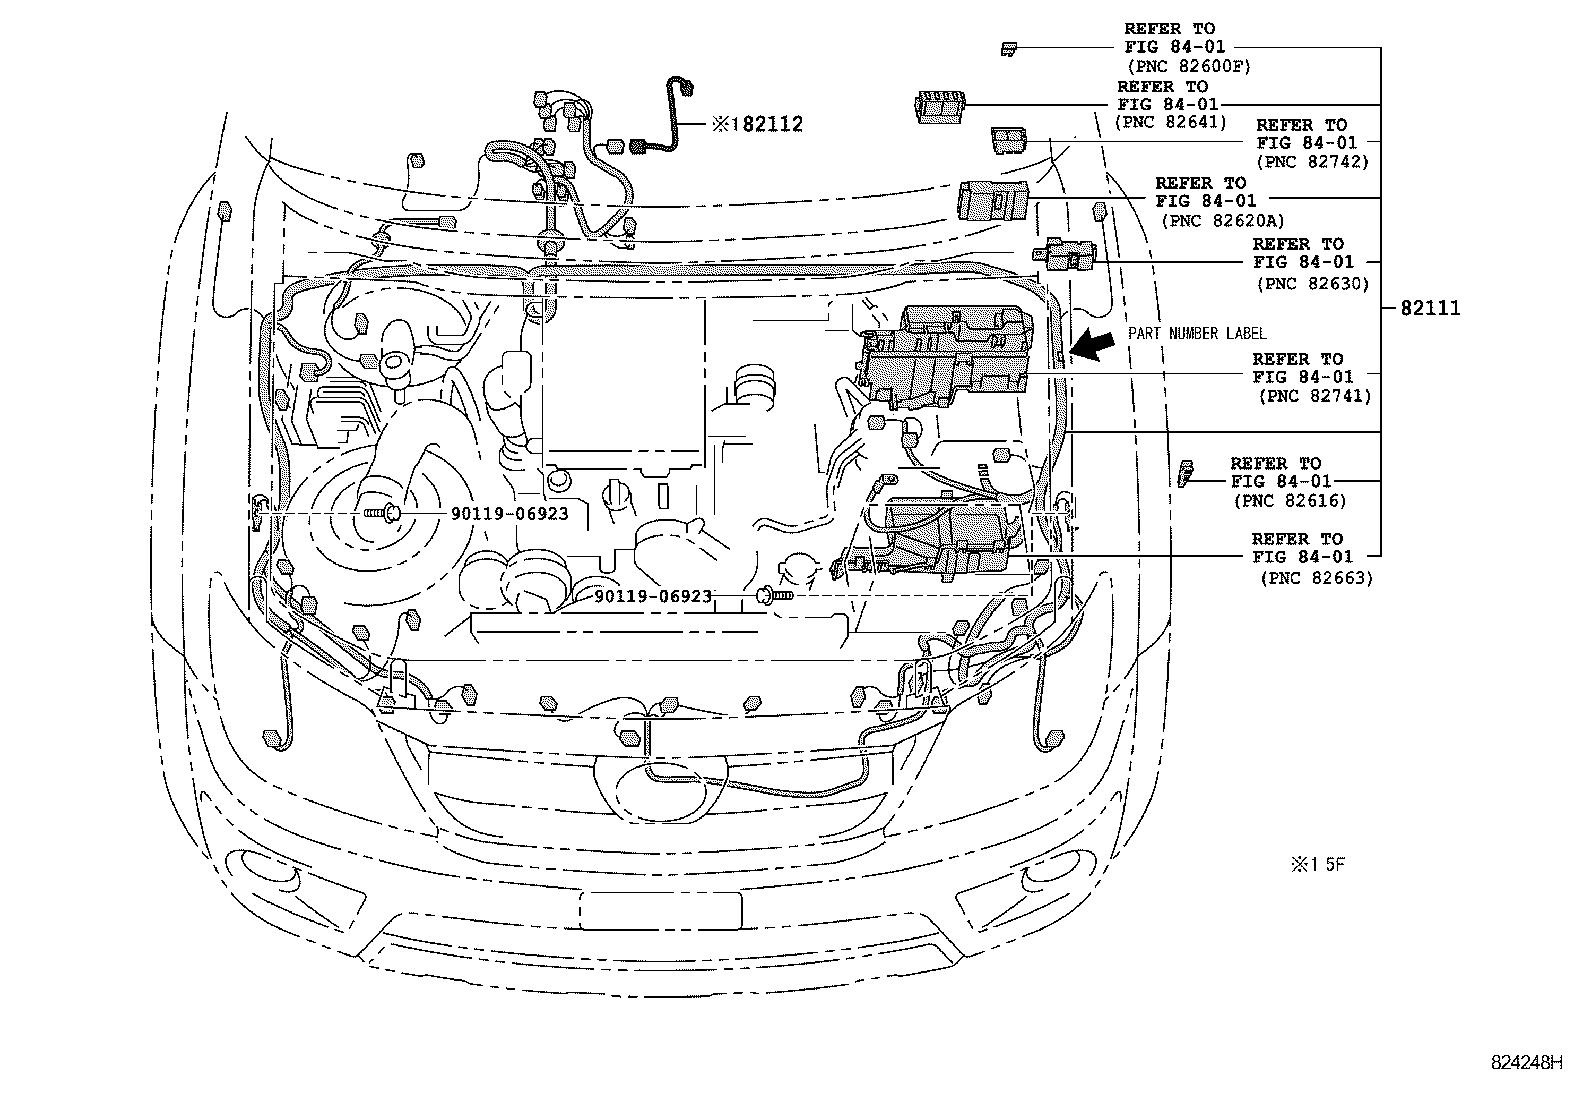 Wiring Diagram Toyota Fortuner : Wiring diagram toyota fortuner jeffdoedesign